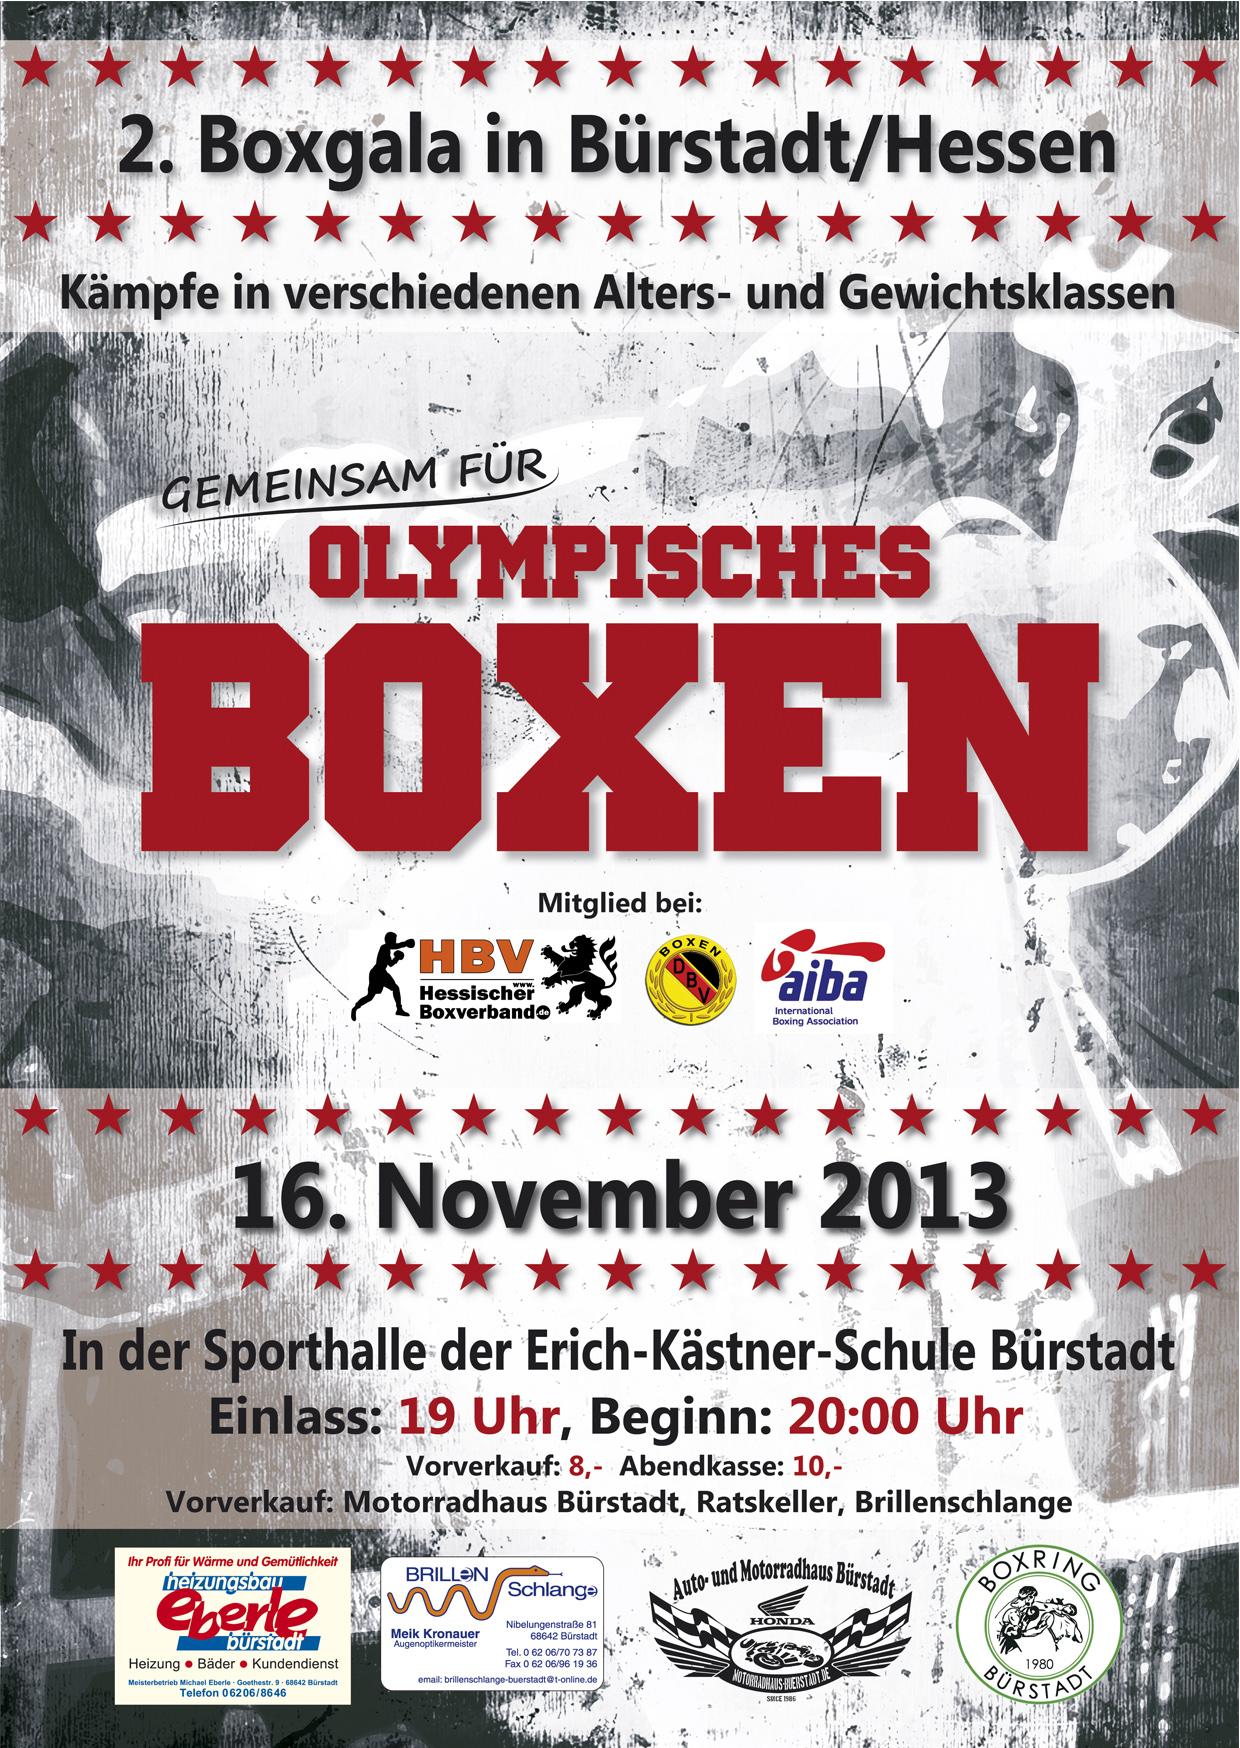 2. Boxgala in Bürstadt am 16.11.2013